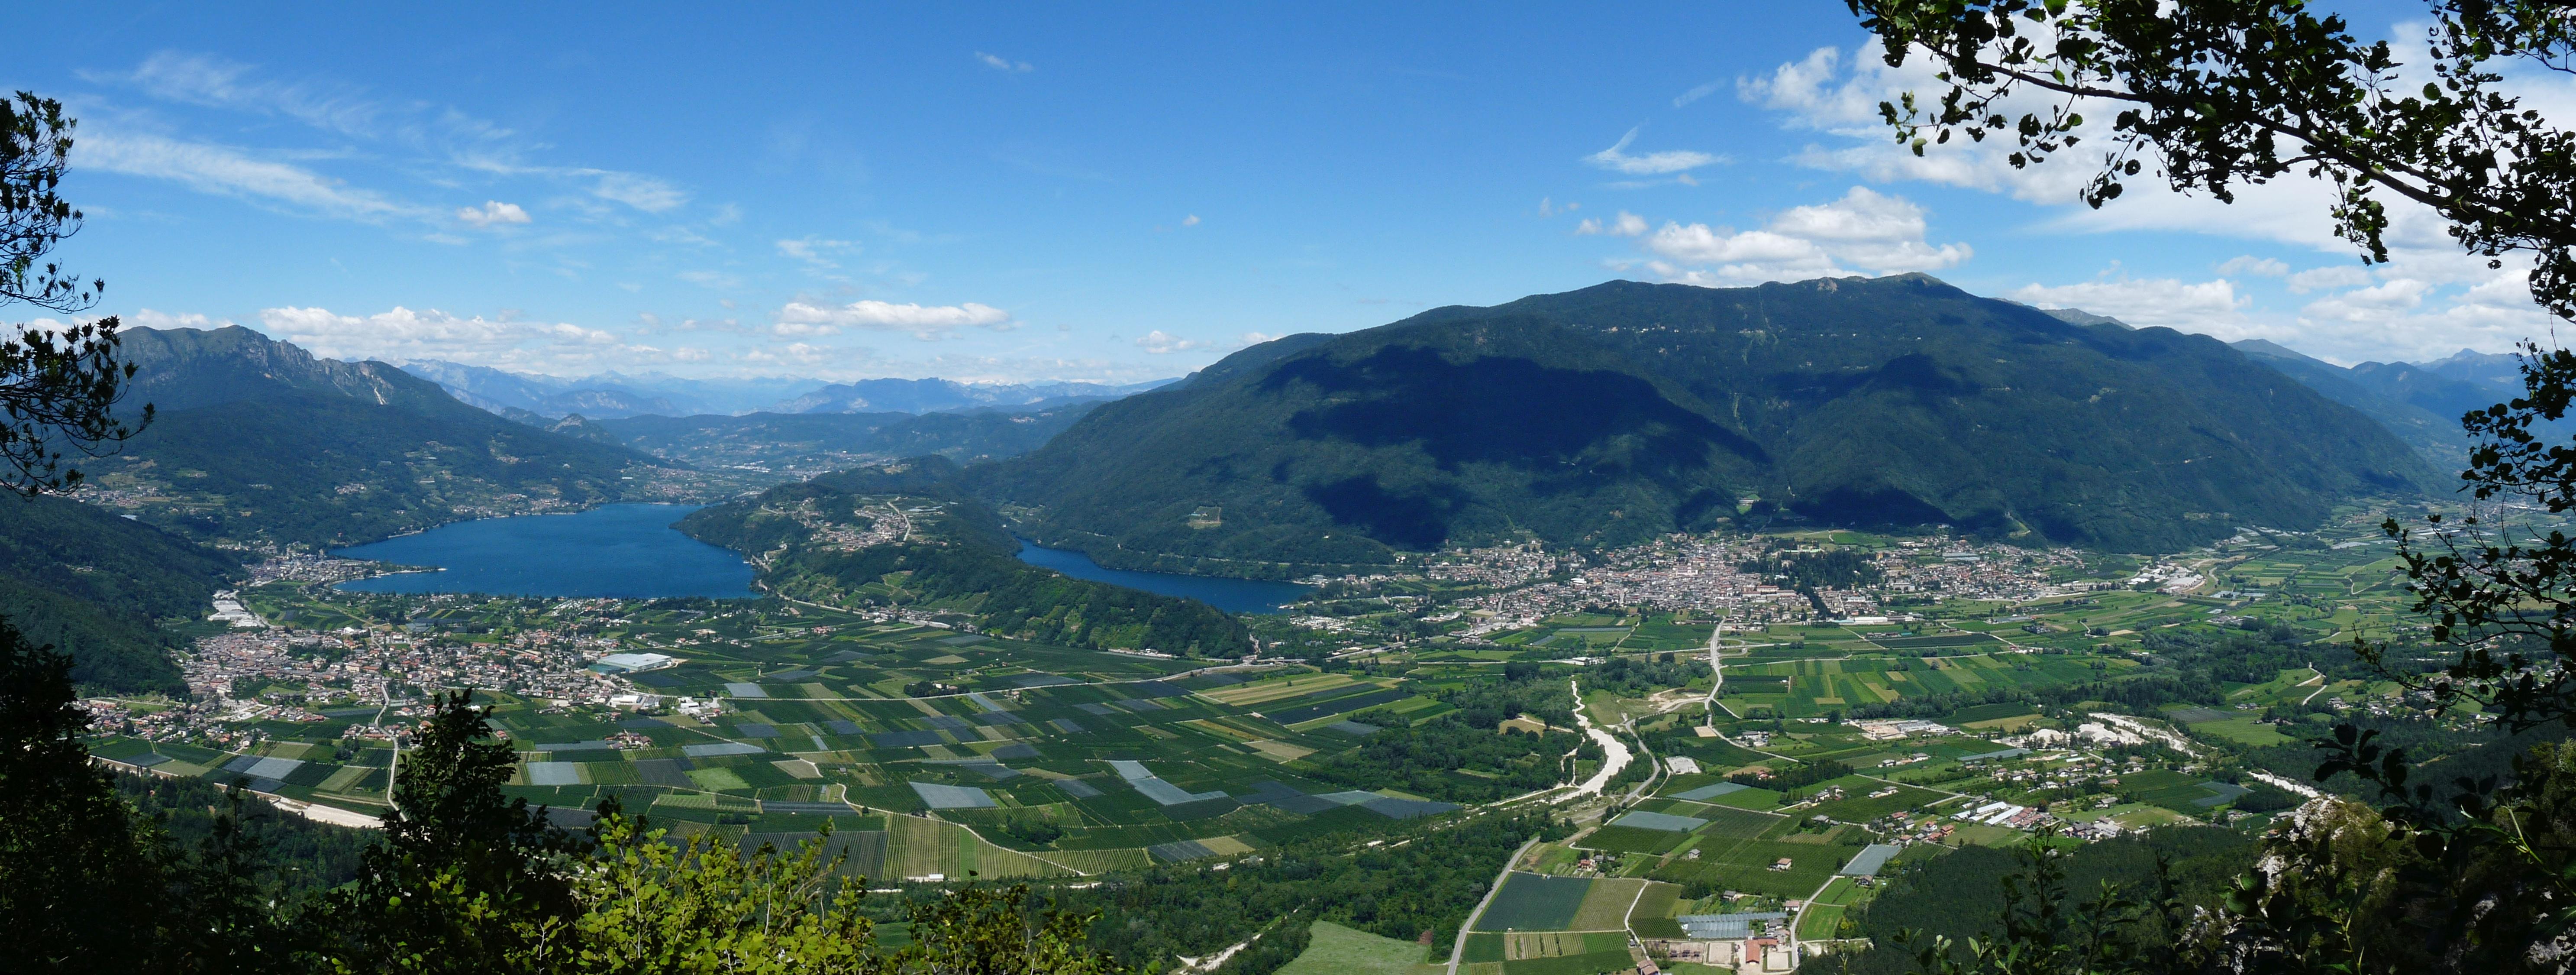 File:Caldonazzo and Levico Terme-panorama.jpg